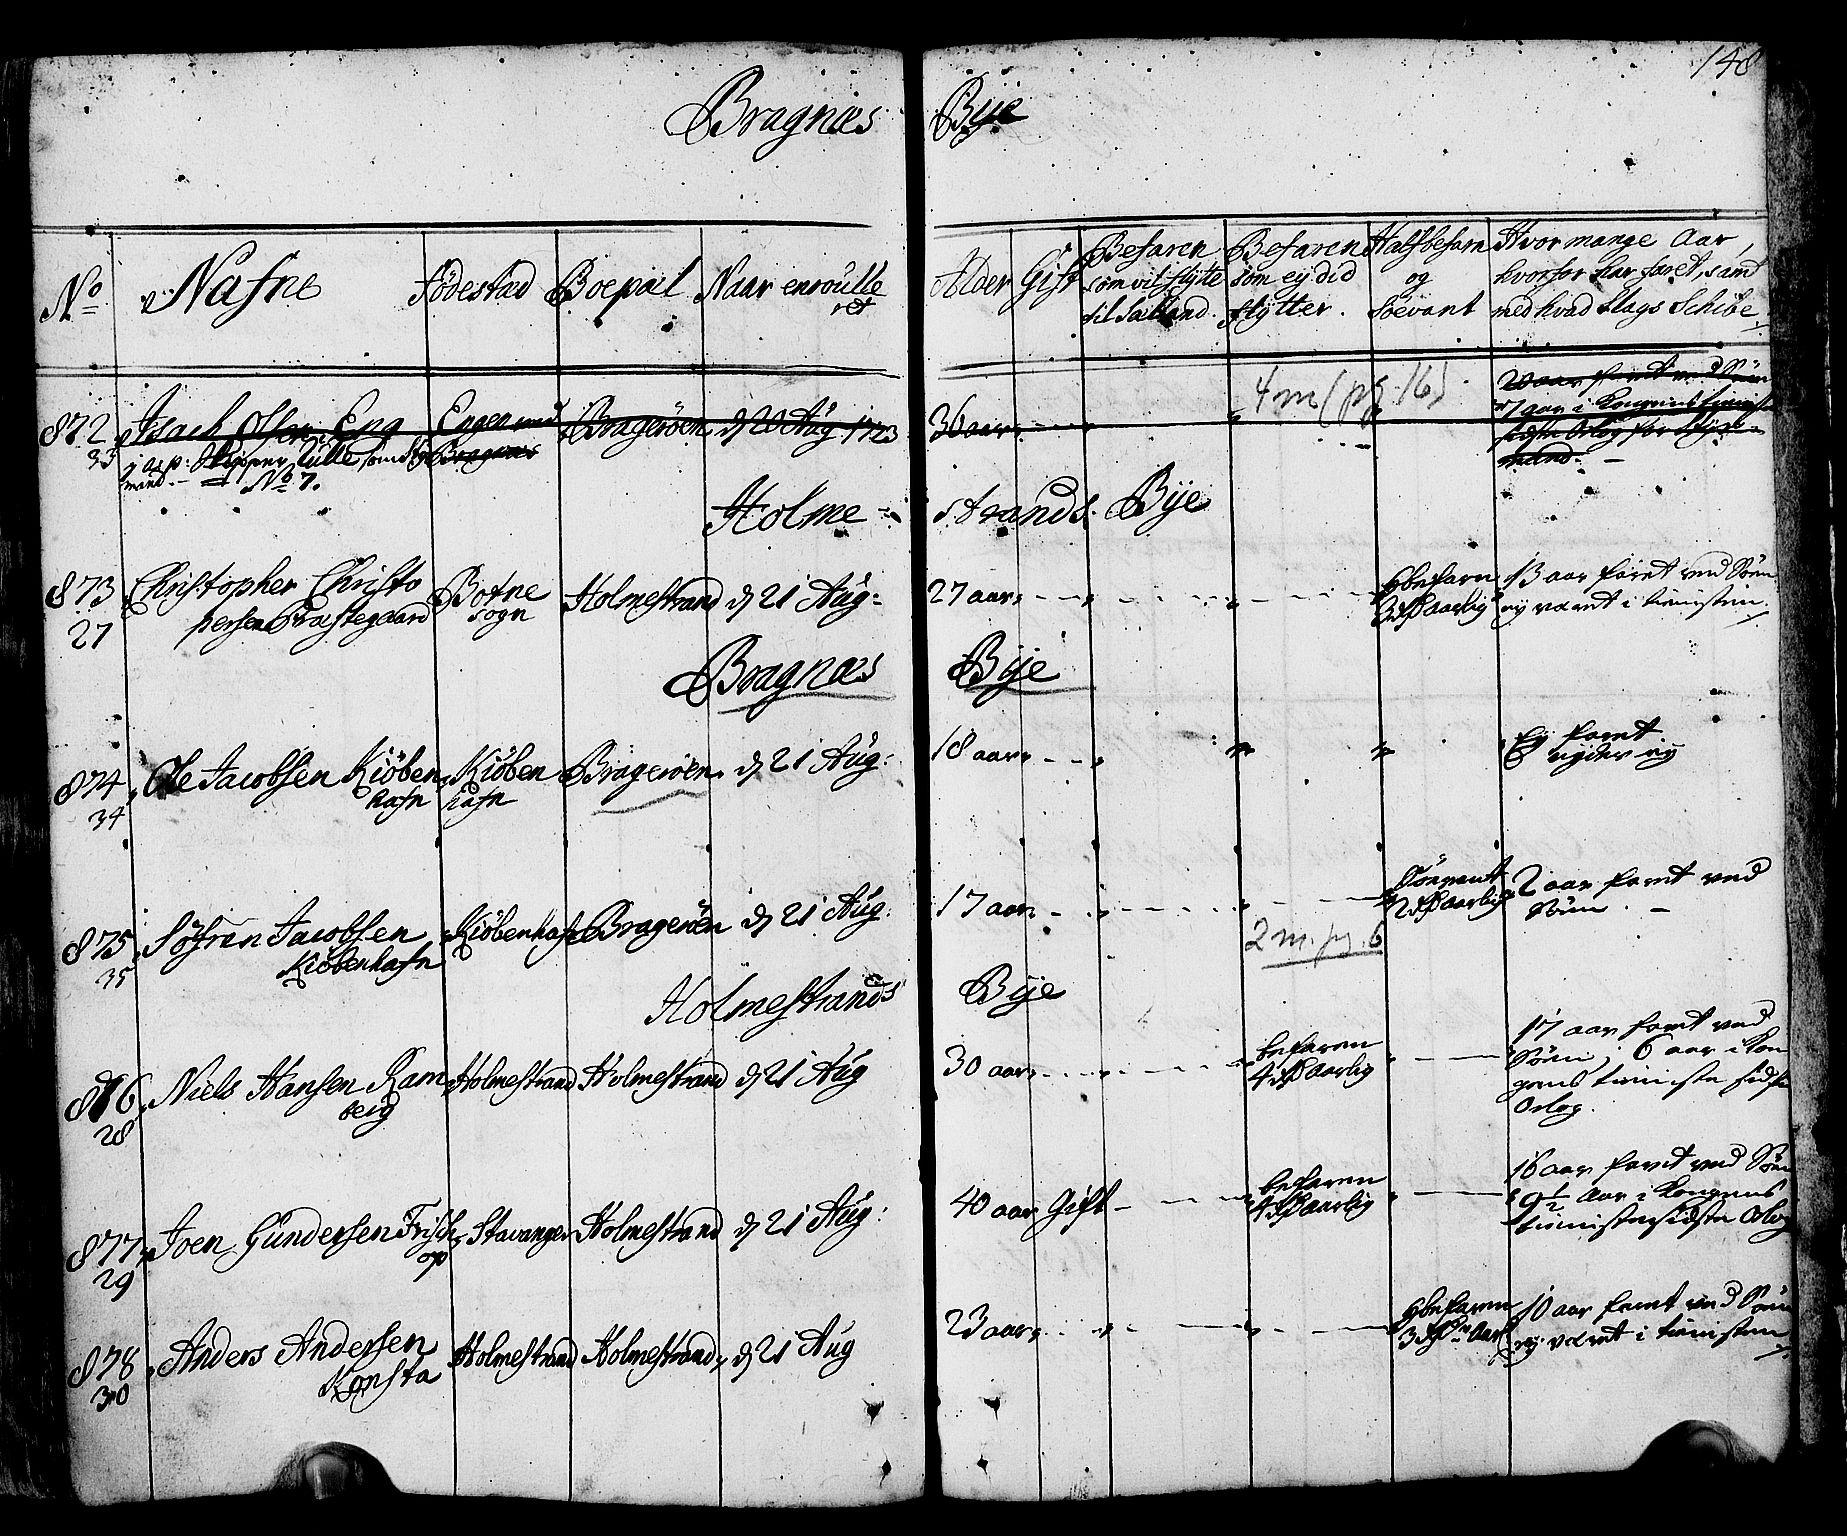 SAKO, Drammen innrulleringsdistrikt, F/Fa/L0002: Hovedrulle, 1723-1726, p. 149